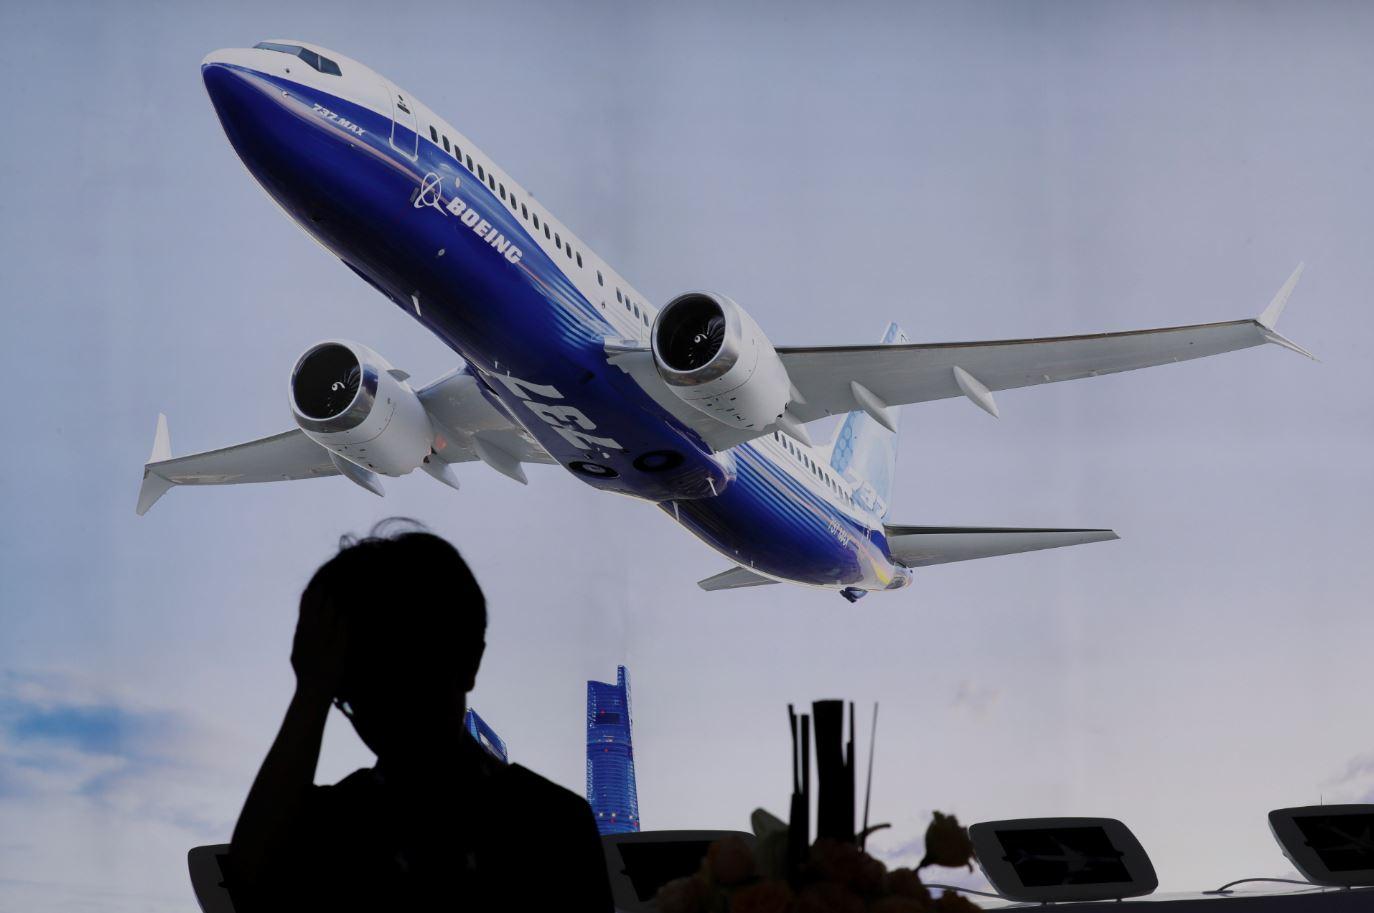 Ropa adecuada ayuda a sobrevivir a un accidente de avión